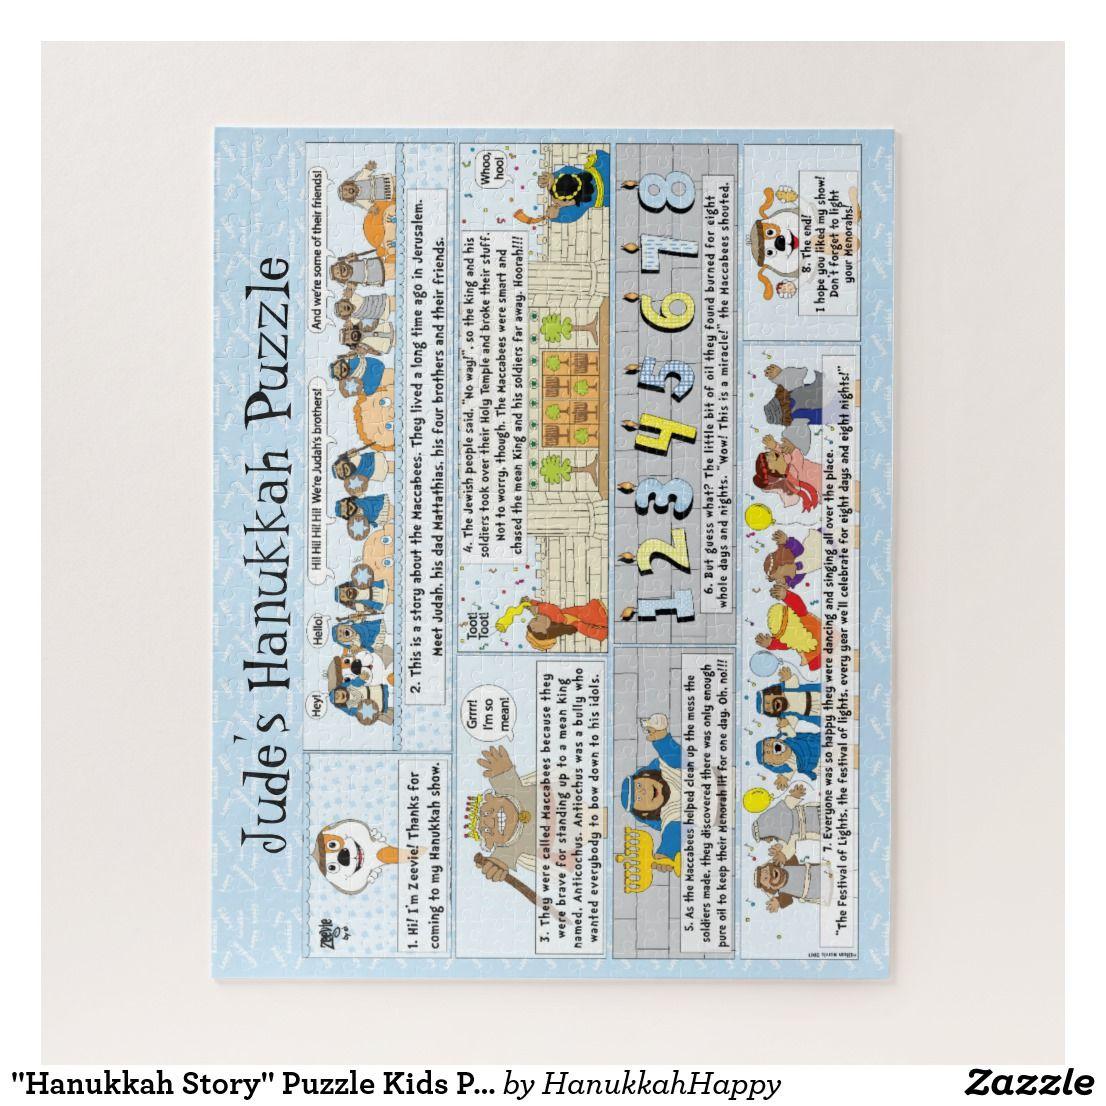 Hanukkah Story Puzzle Kids Personalized 16 X 20